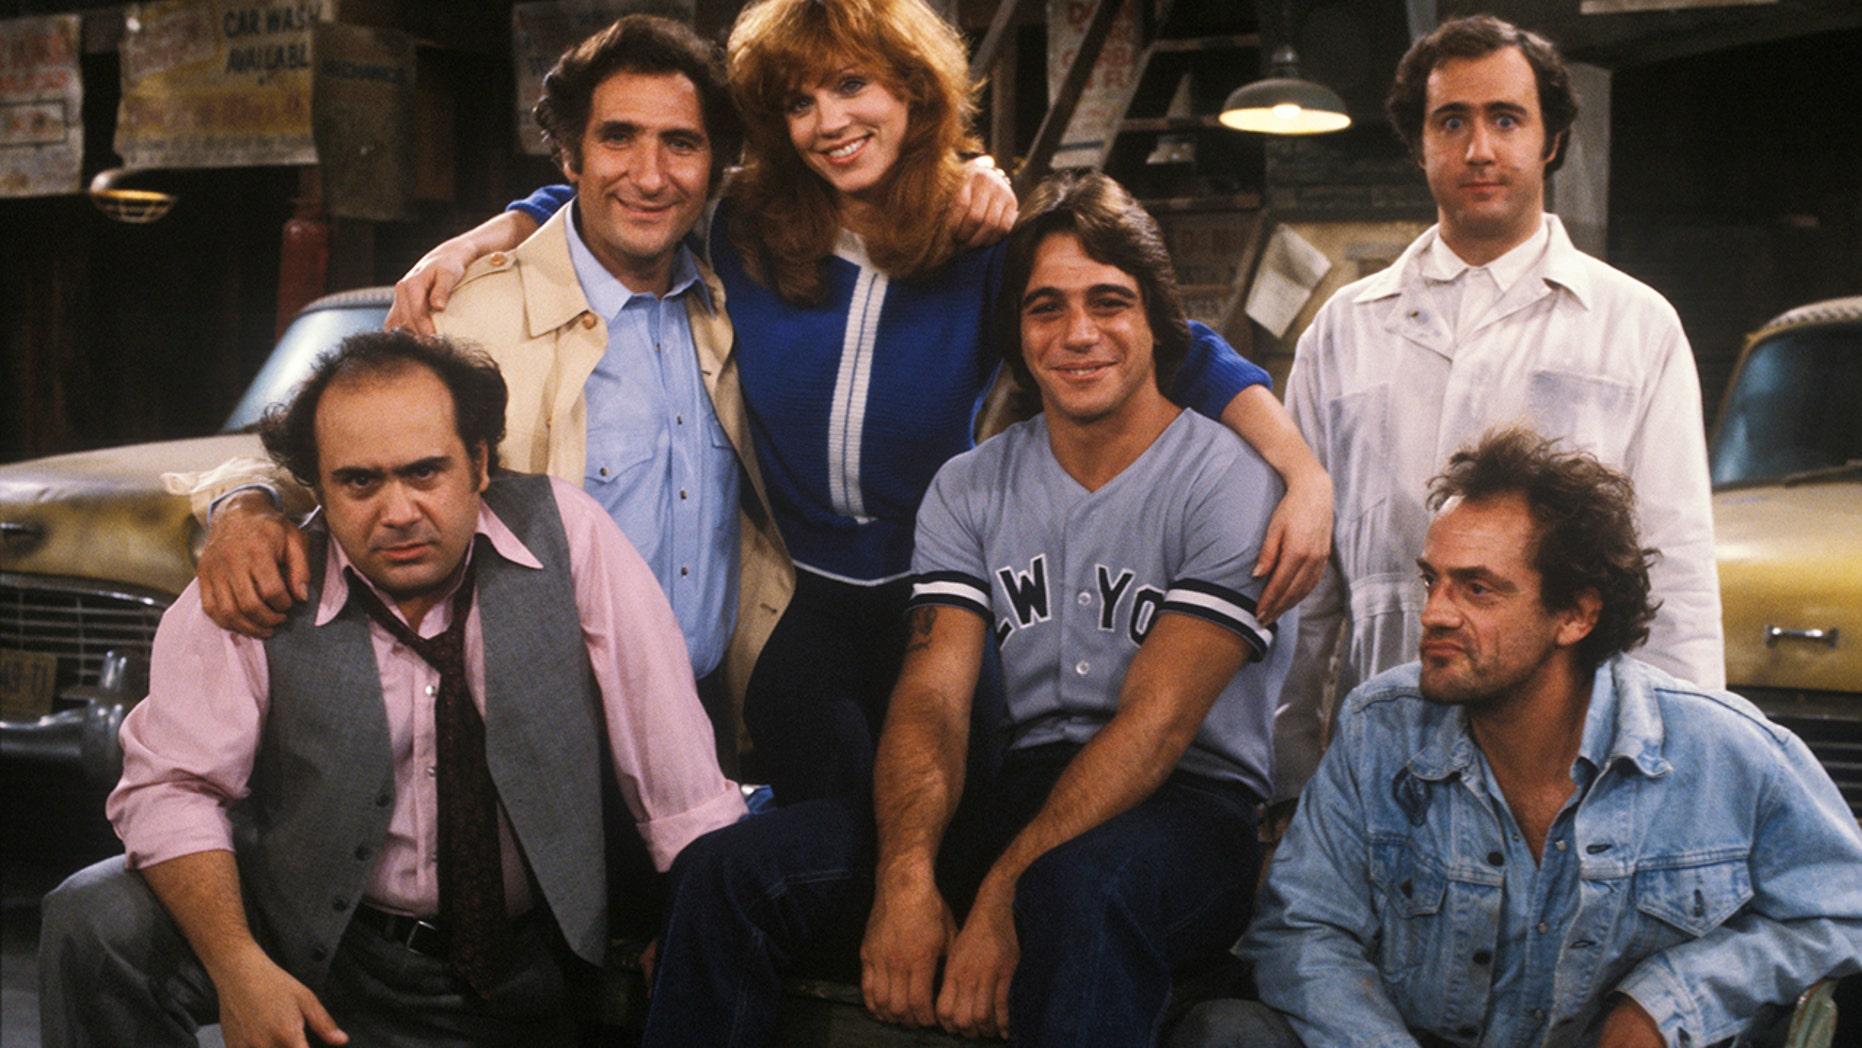 'Taxi' stars recall on-set secrets, spill on 'crazy' cast ...